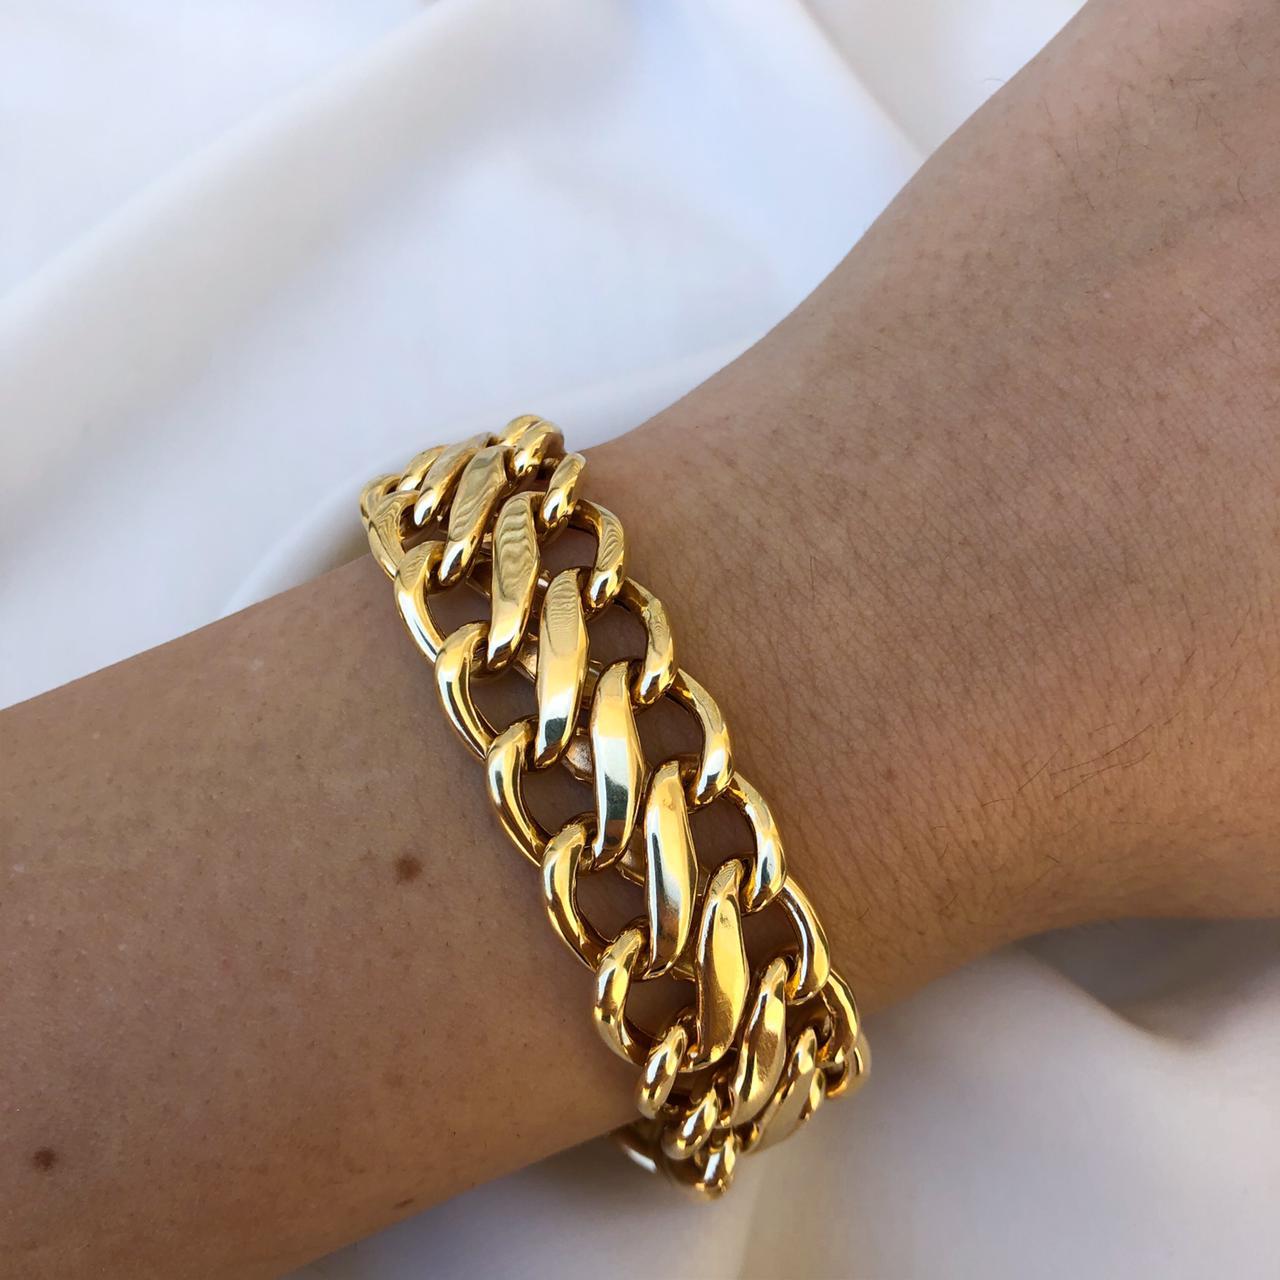 Pulseira Malha Lacraia em Ouro 18K 21cm